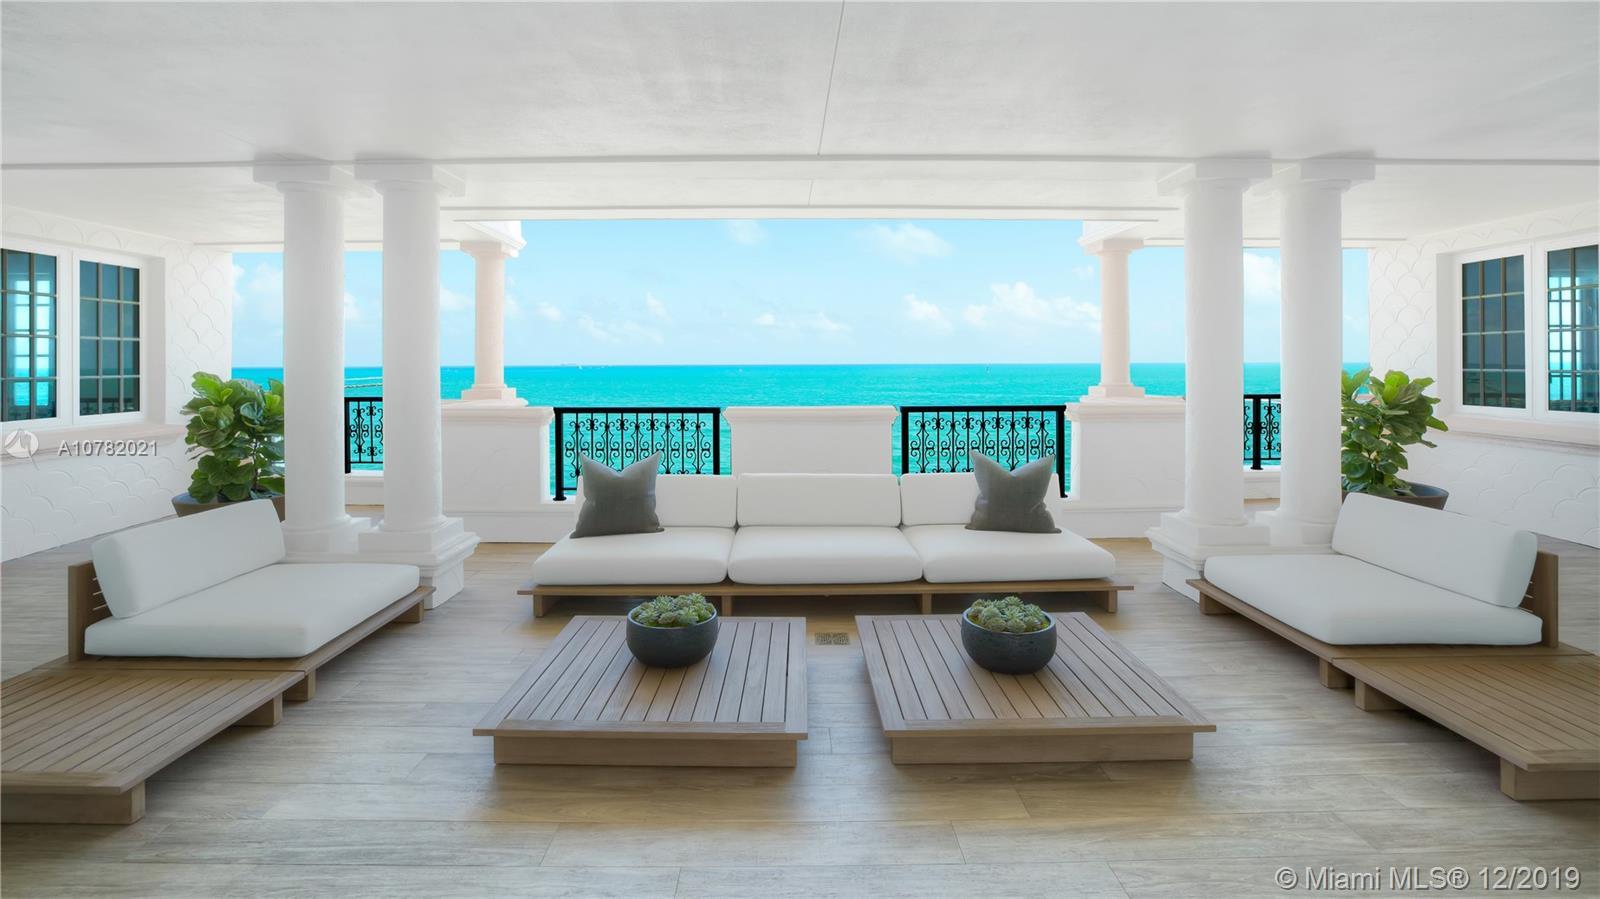 7764 Fisher Island Dr 7764, Miami Beach, FL 33109